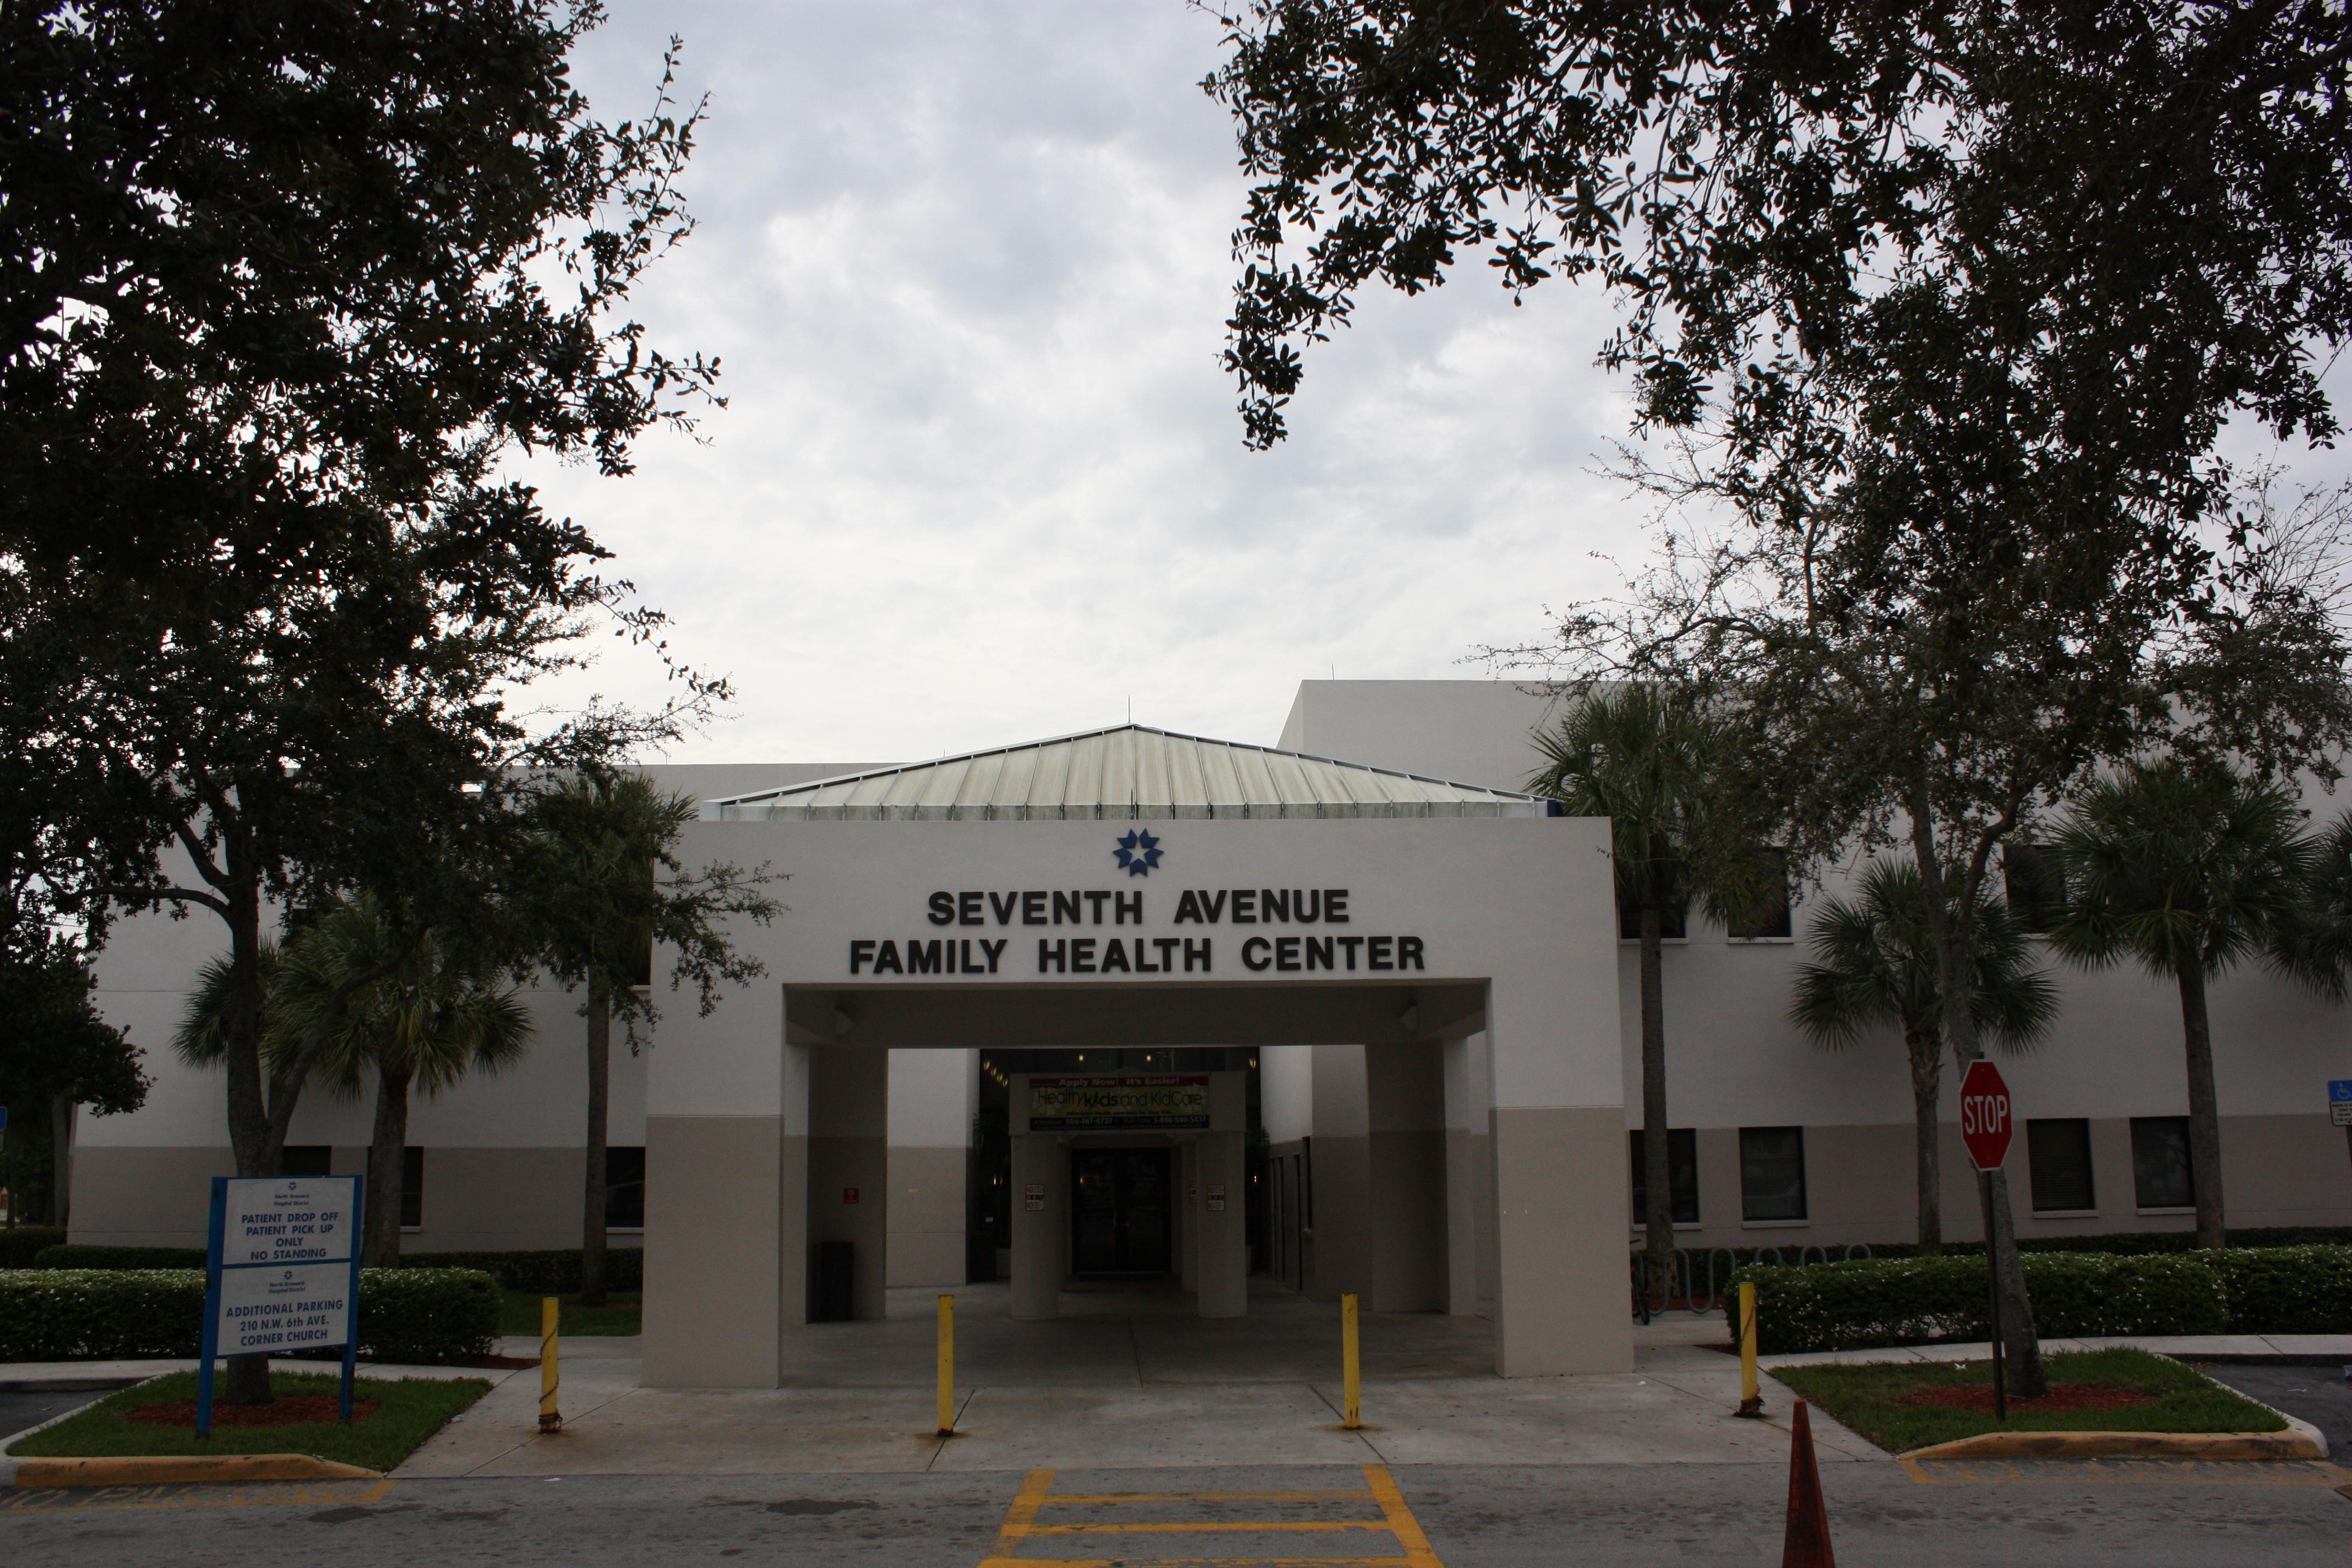 Seventh Avenue Family Health Center